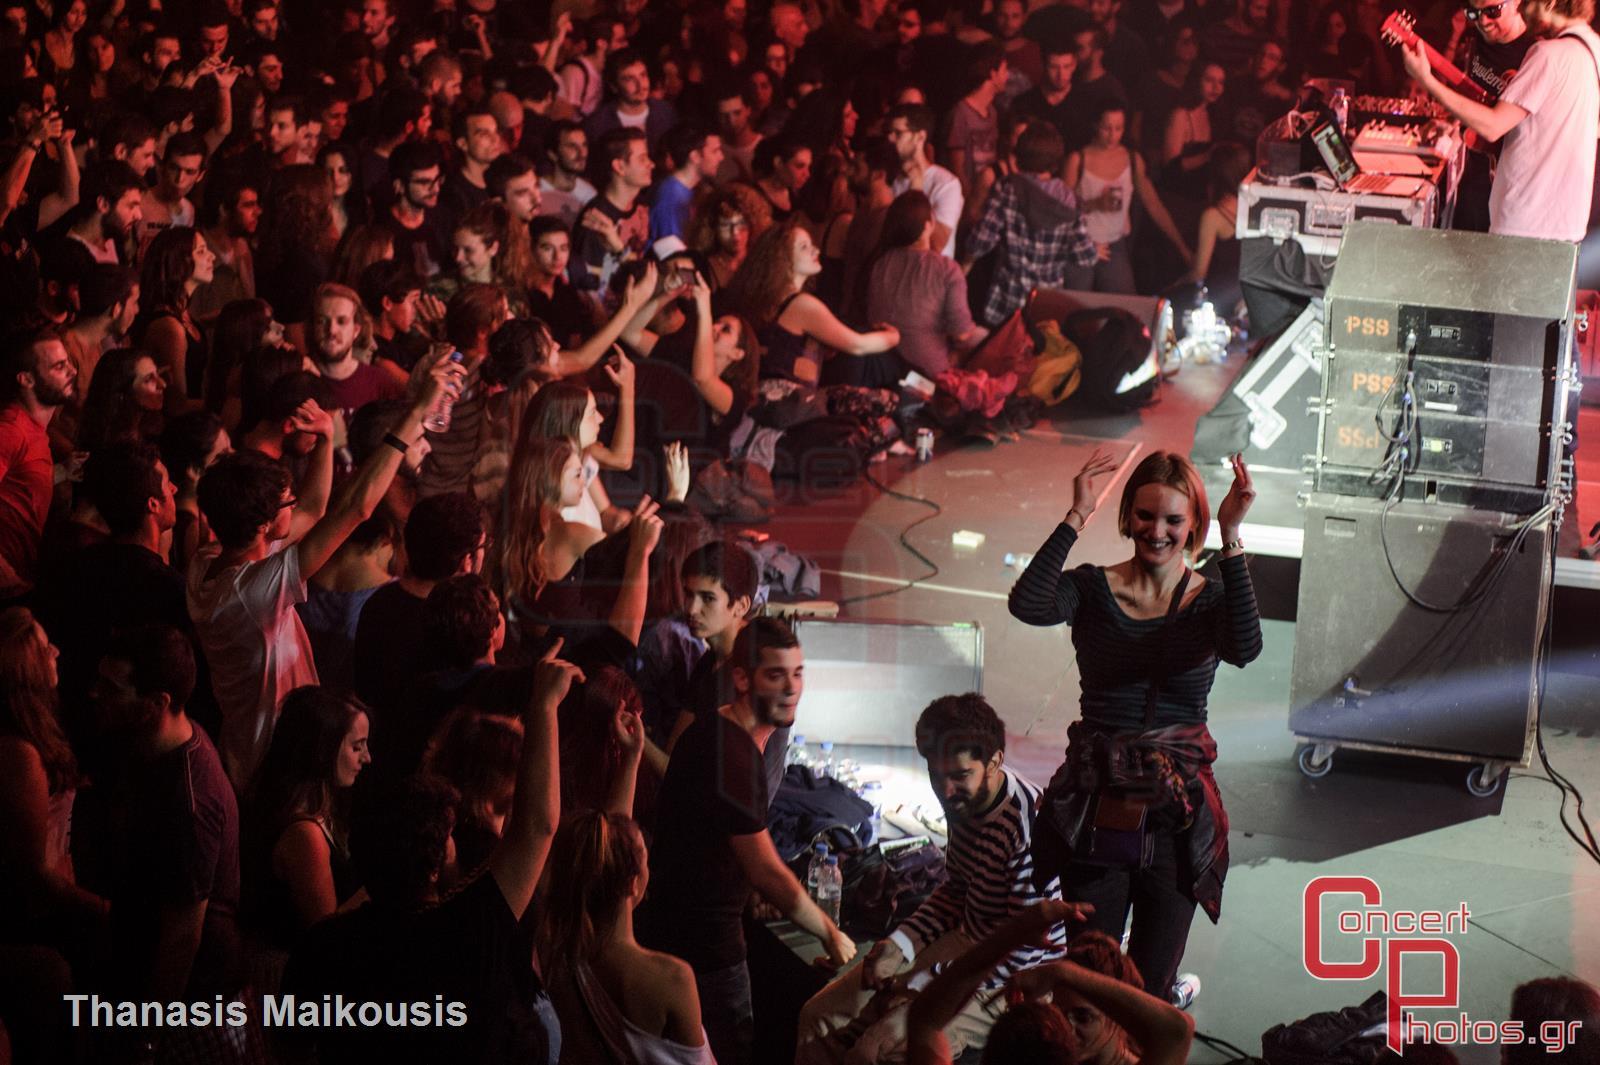 Gramatik-Gramatik Votanikos 2013 photographer: Thanasis Maikousis - ConcertPhotos-6338